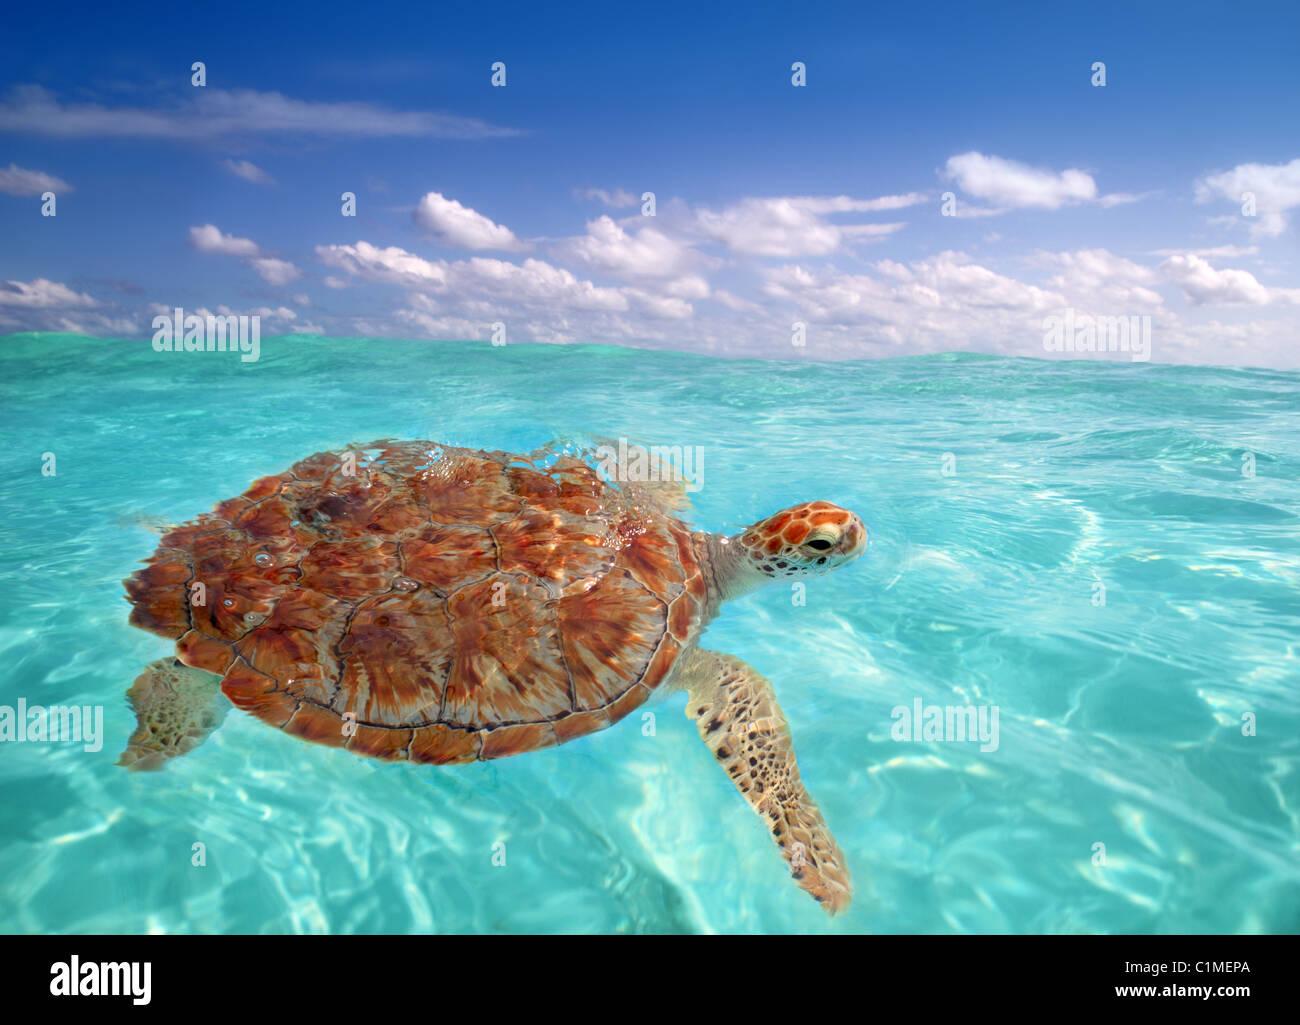 Tortue verte Chelonia mydas mer des Caraïbes Cheloniidae surface de l'eau Photo Stock